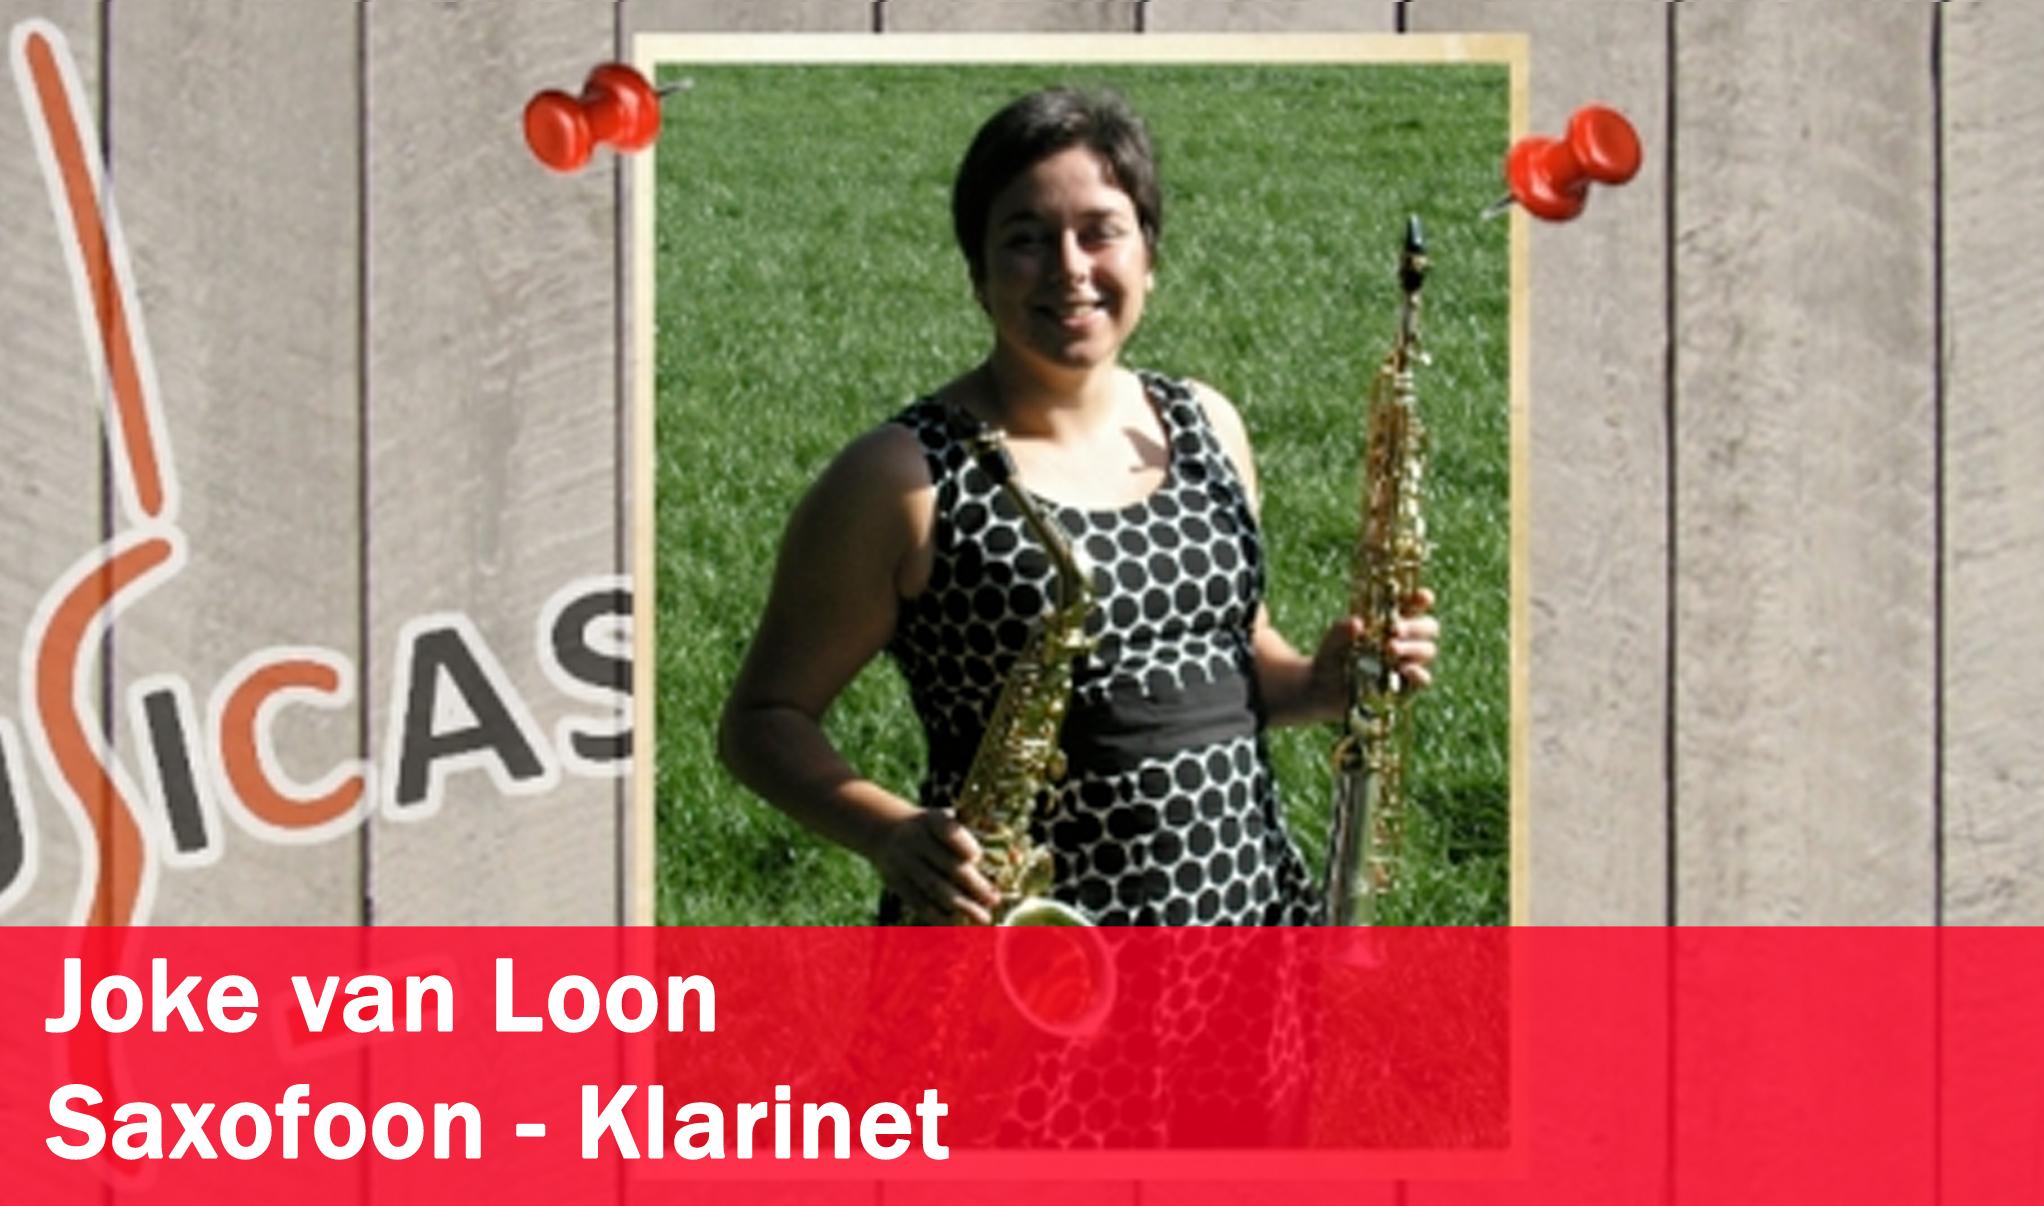 Joke van Loon <br>Saxofoon - Klarinet